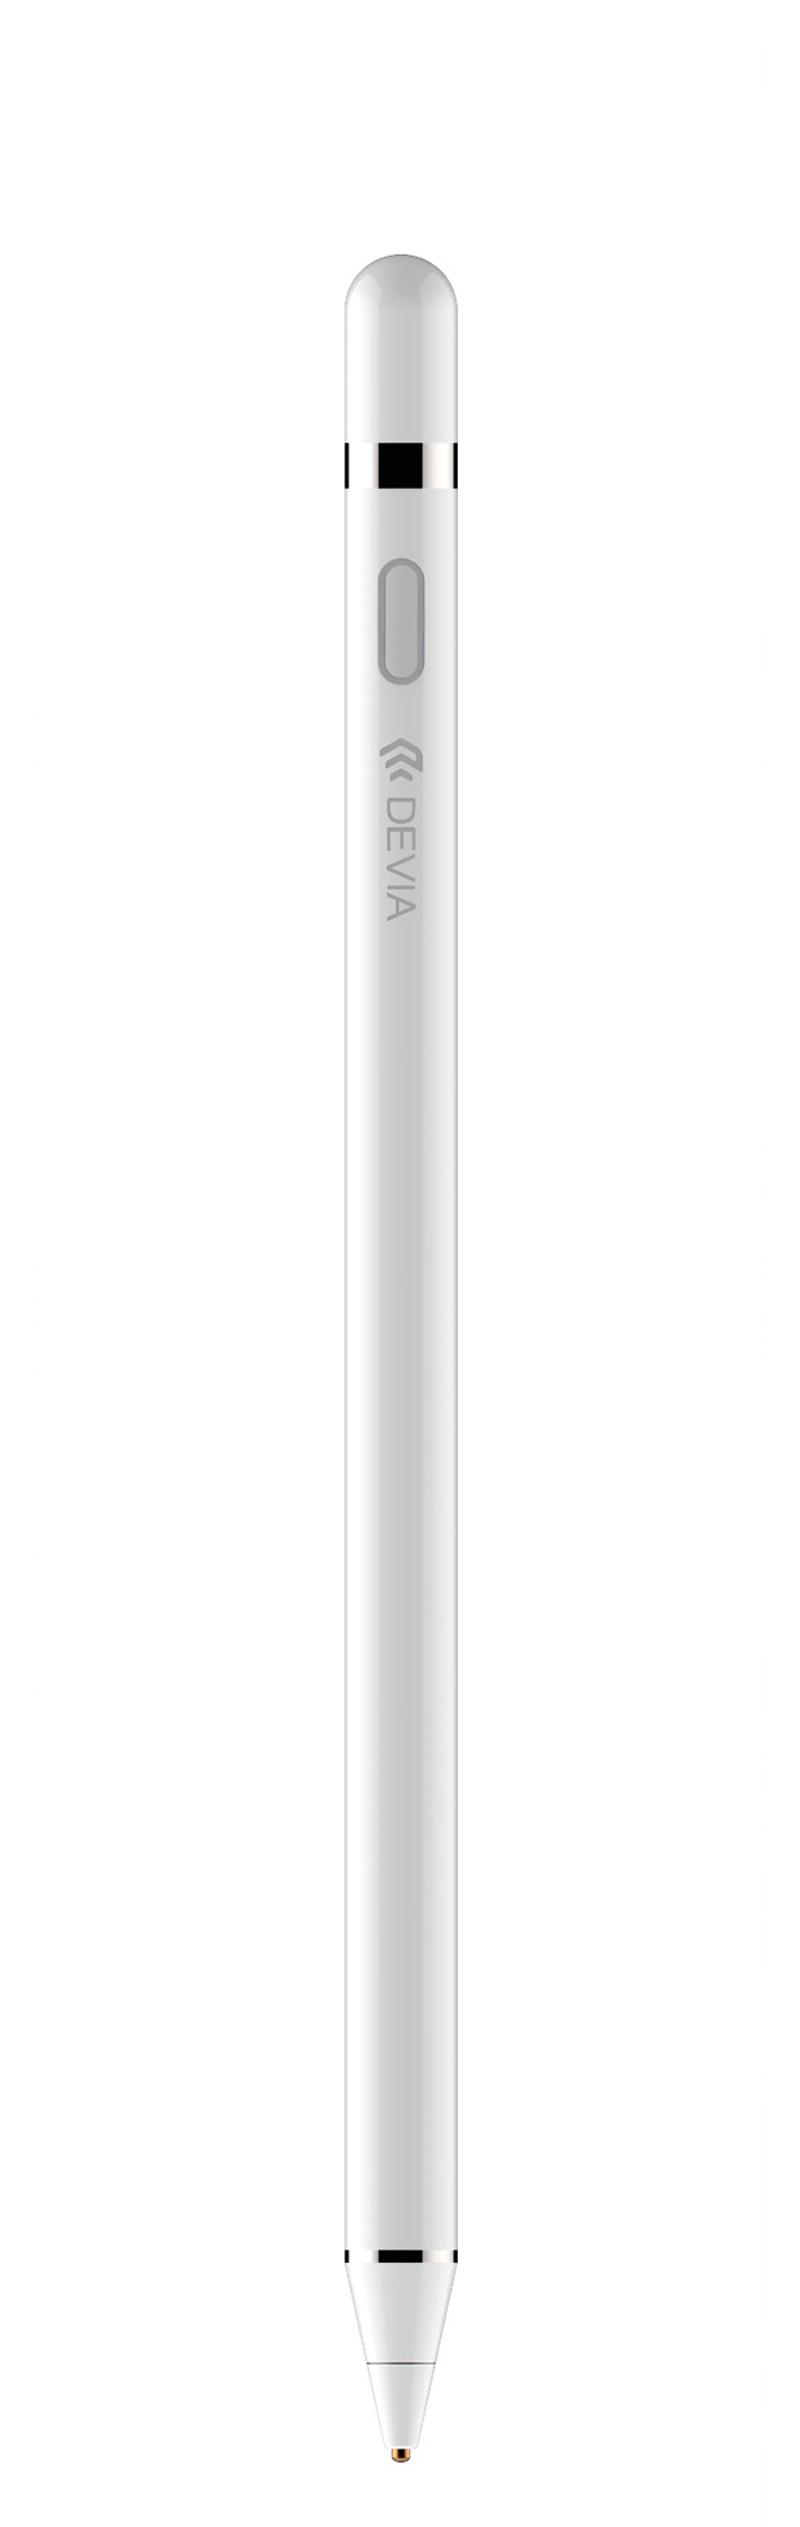 Стилус для графического планшета Devia Touch Pencil, белый ручка стилус philippi doux in a black pencil case z54069 30